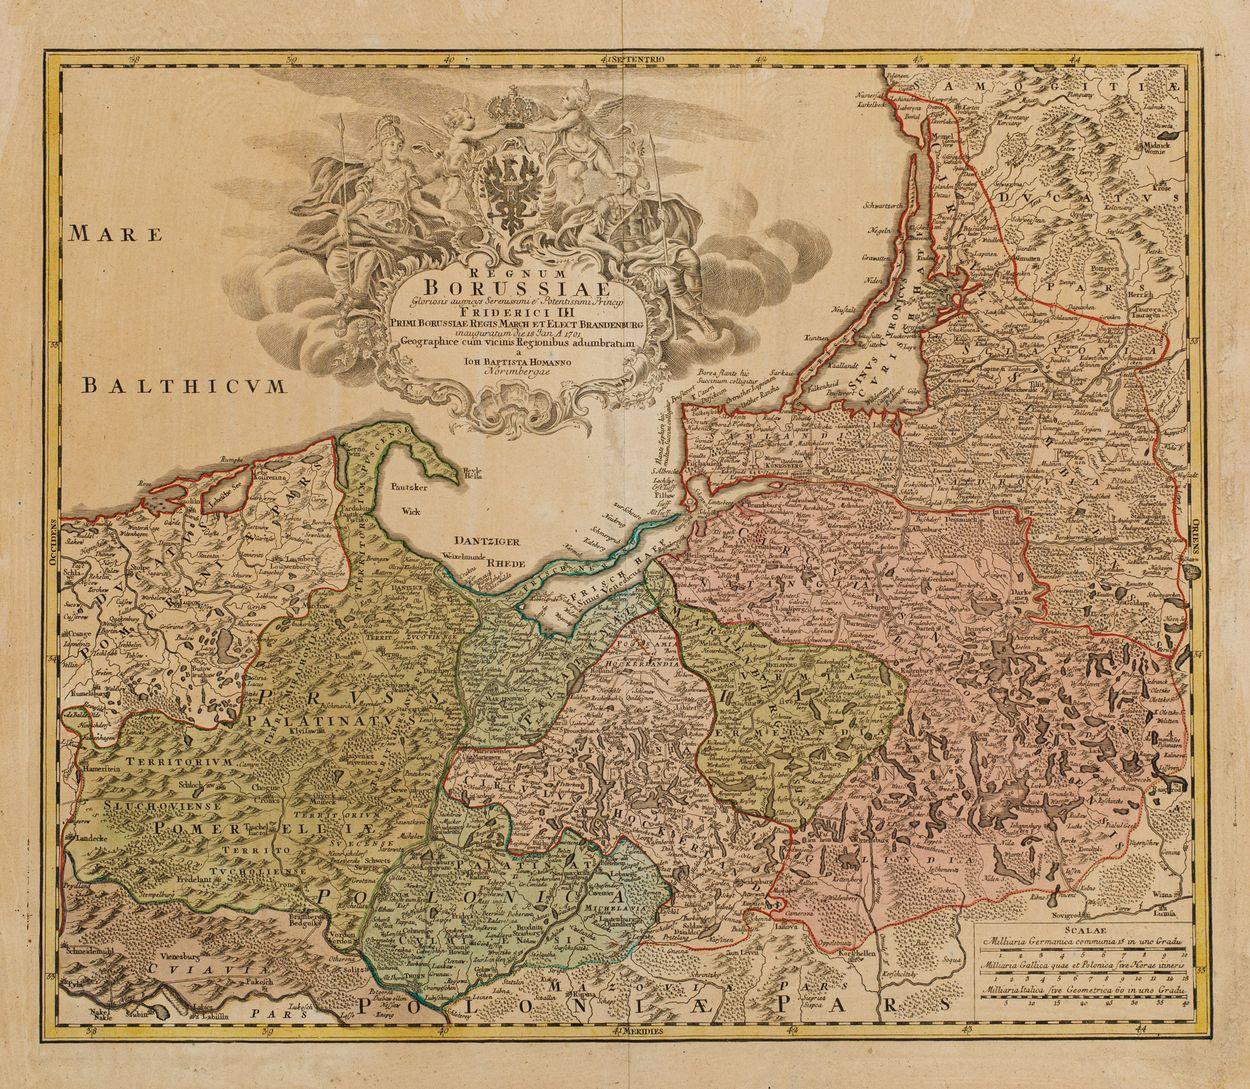 MAPA KRÓLESTWA PRUS, Norymberga, Johan Baptist Homann, 1701-1715